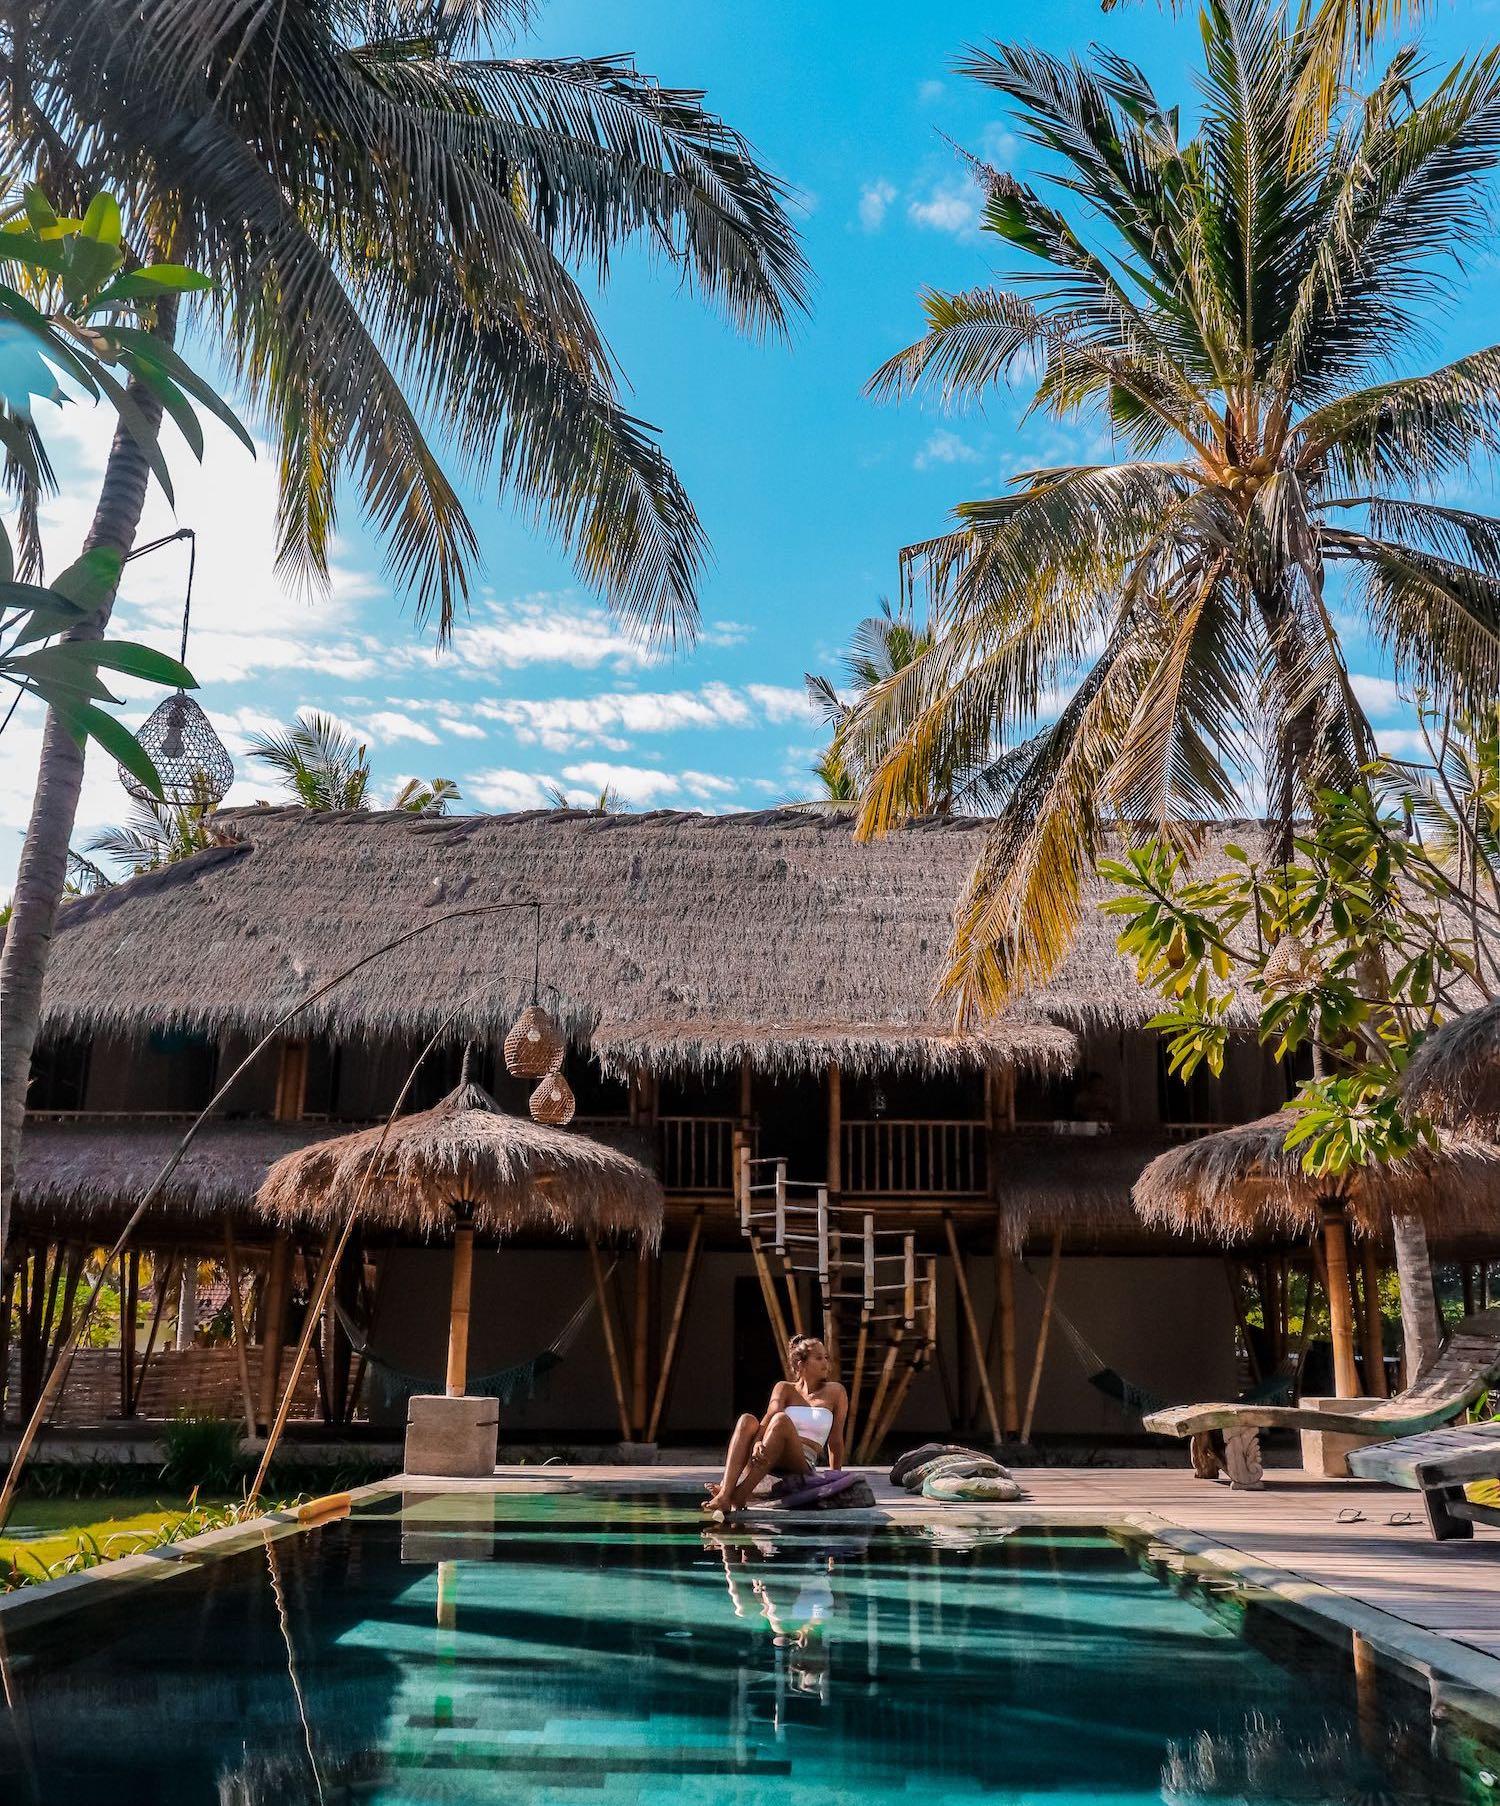 Airbnb Villa Gili Trawangan - Bes things to do on Gil iT 2020